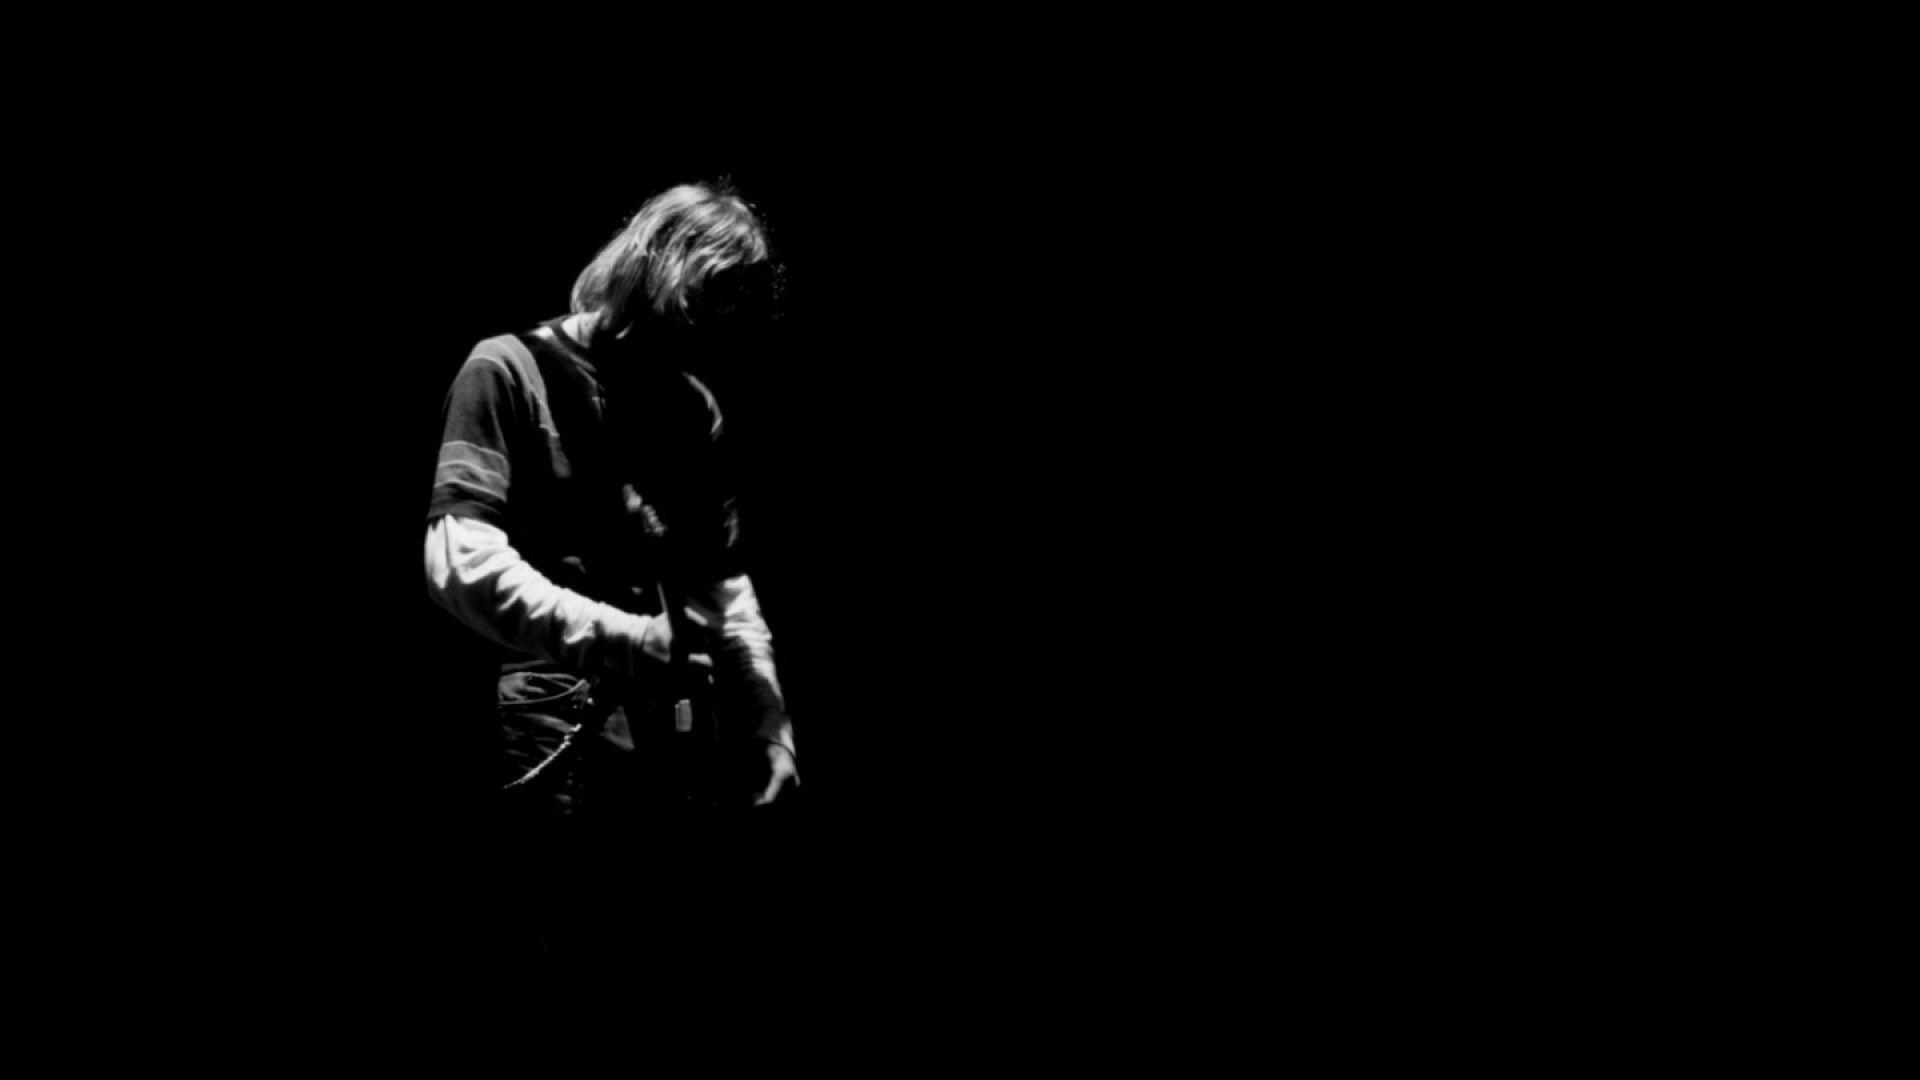 Band Wallpapers Music Artists: Kurt Cobain Backgrounds